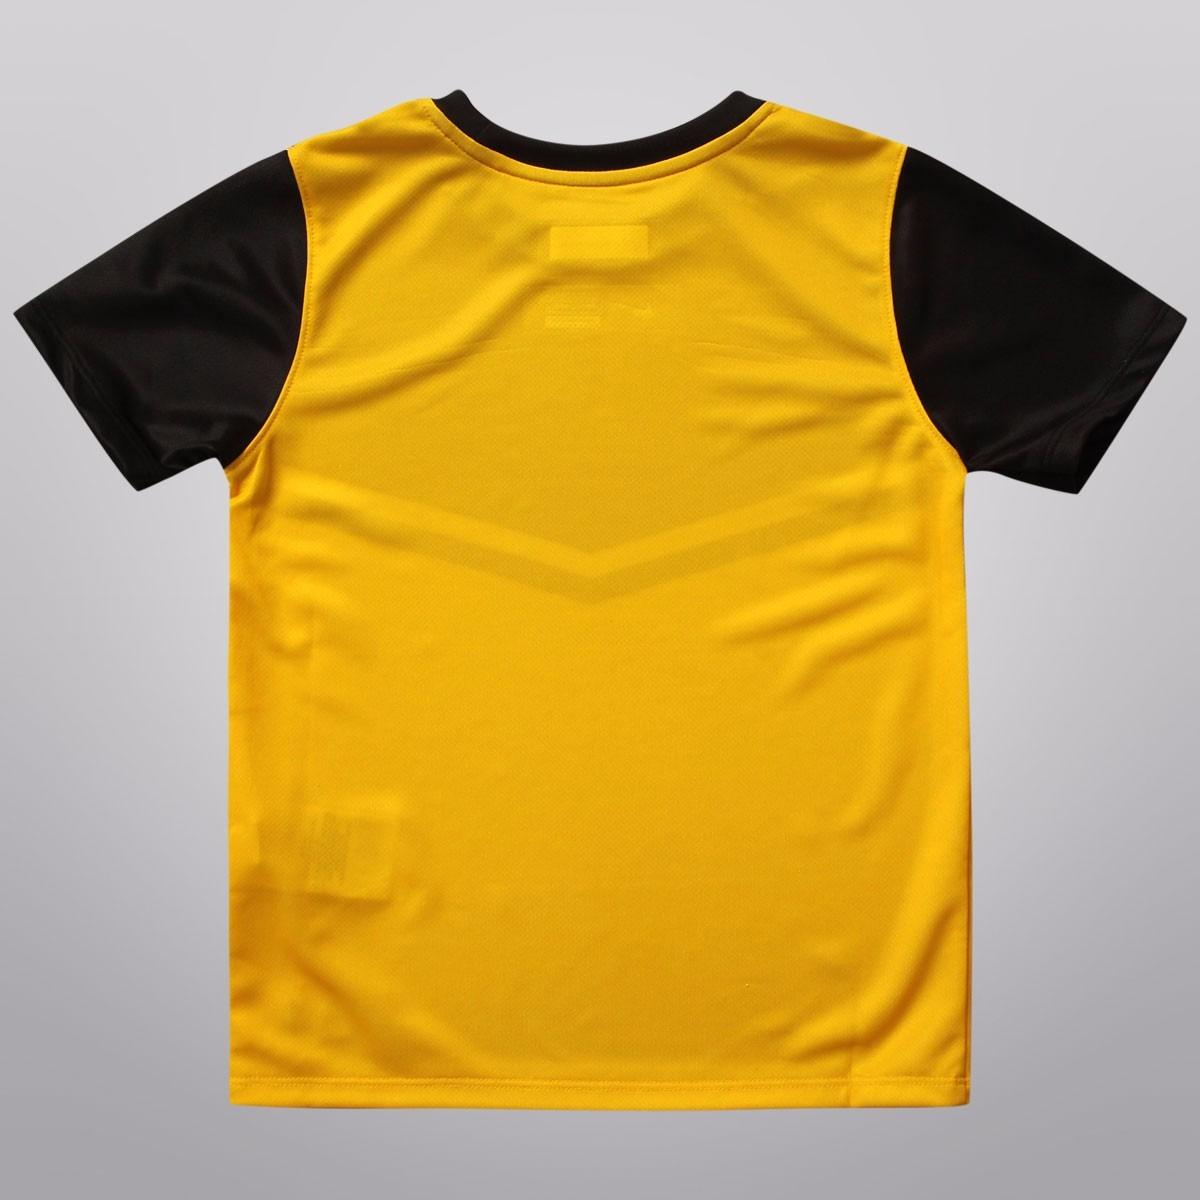 86ed023ac00b8 camisa santos feminina nike amarela uniforme ill. Carregando zoom.